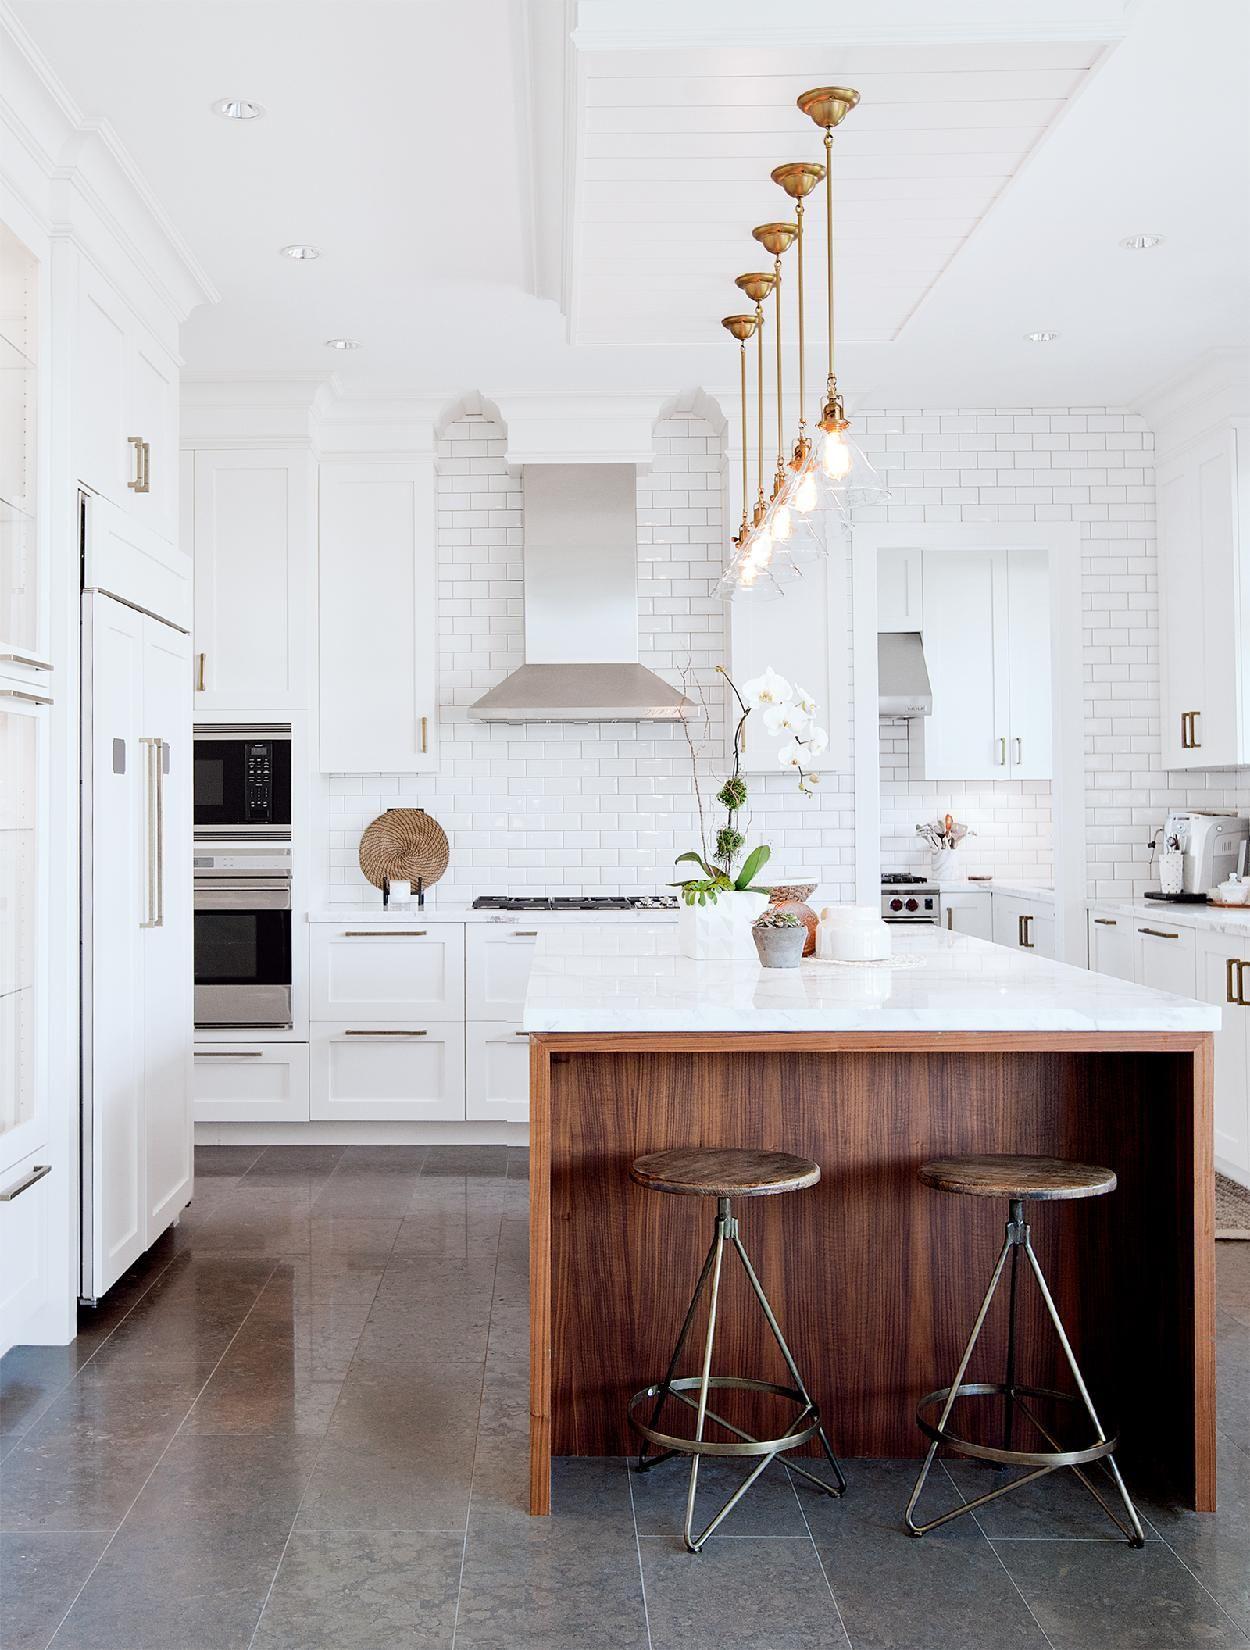 Pinterest: heyitsglor | Dream house | Pinterest | Cocinas ...